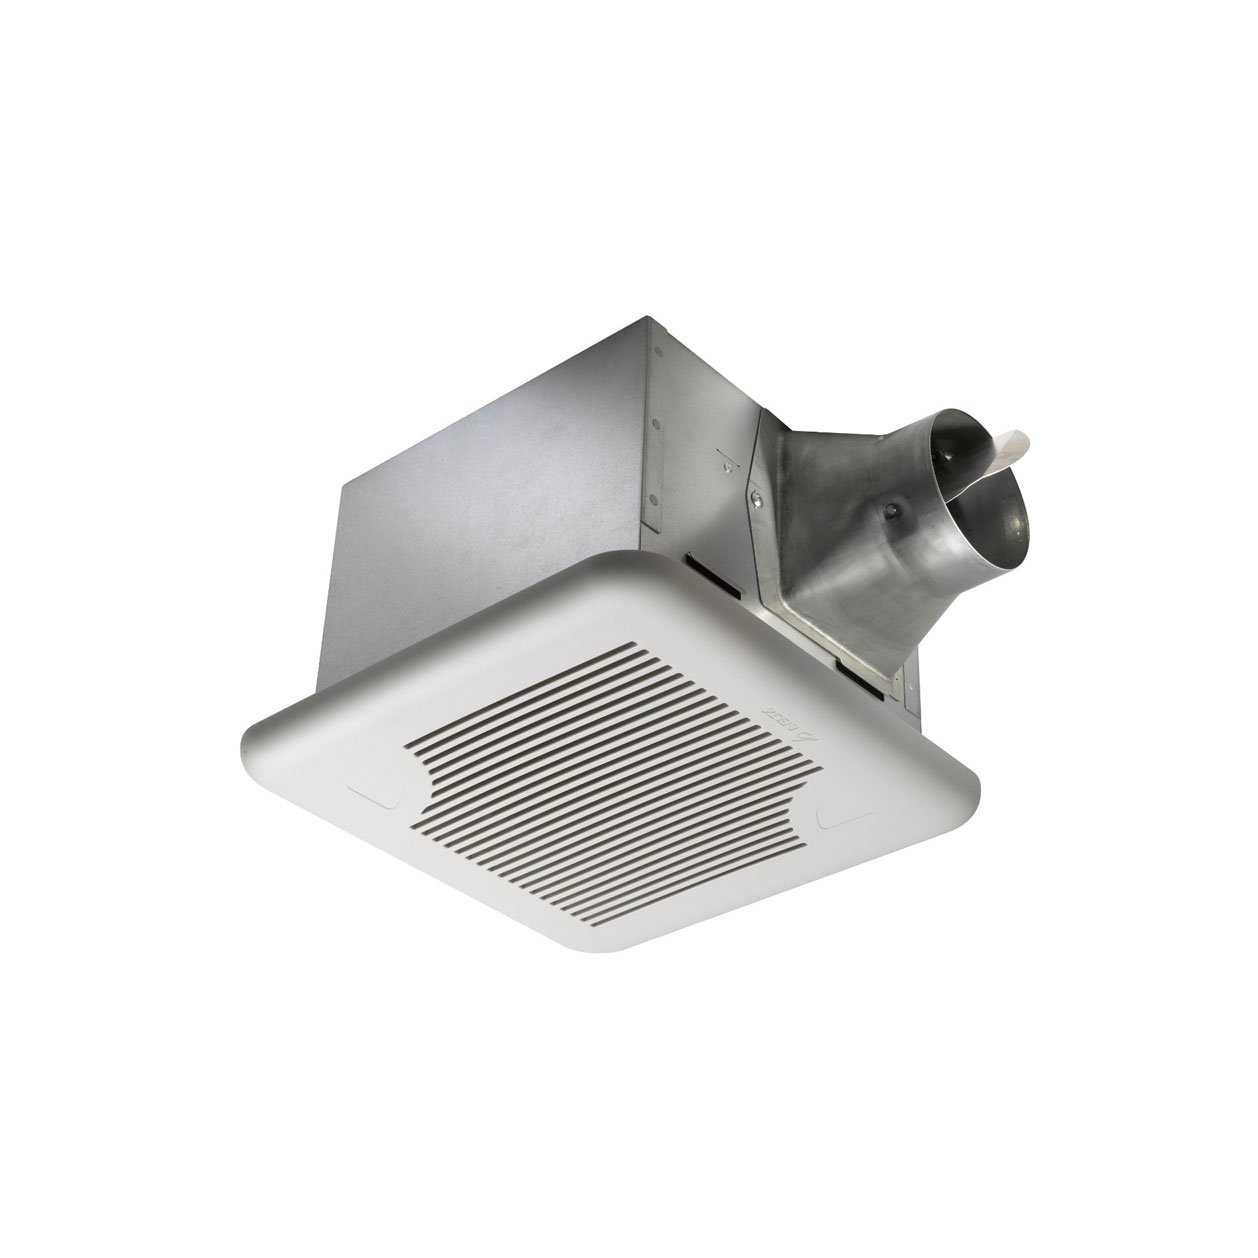 Amazon.com: Delta BreezSignature SIG80M 80 CFM Exhaust Bath Fan With Motion  Sensor And Delay Timer: Home Improvement